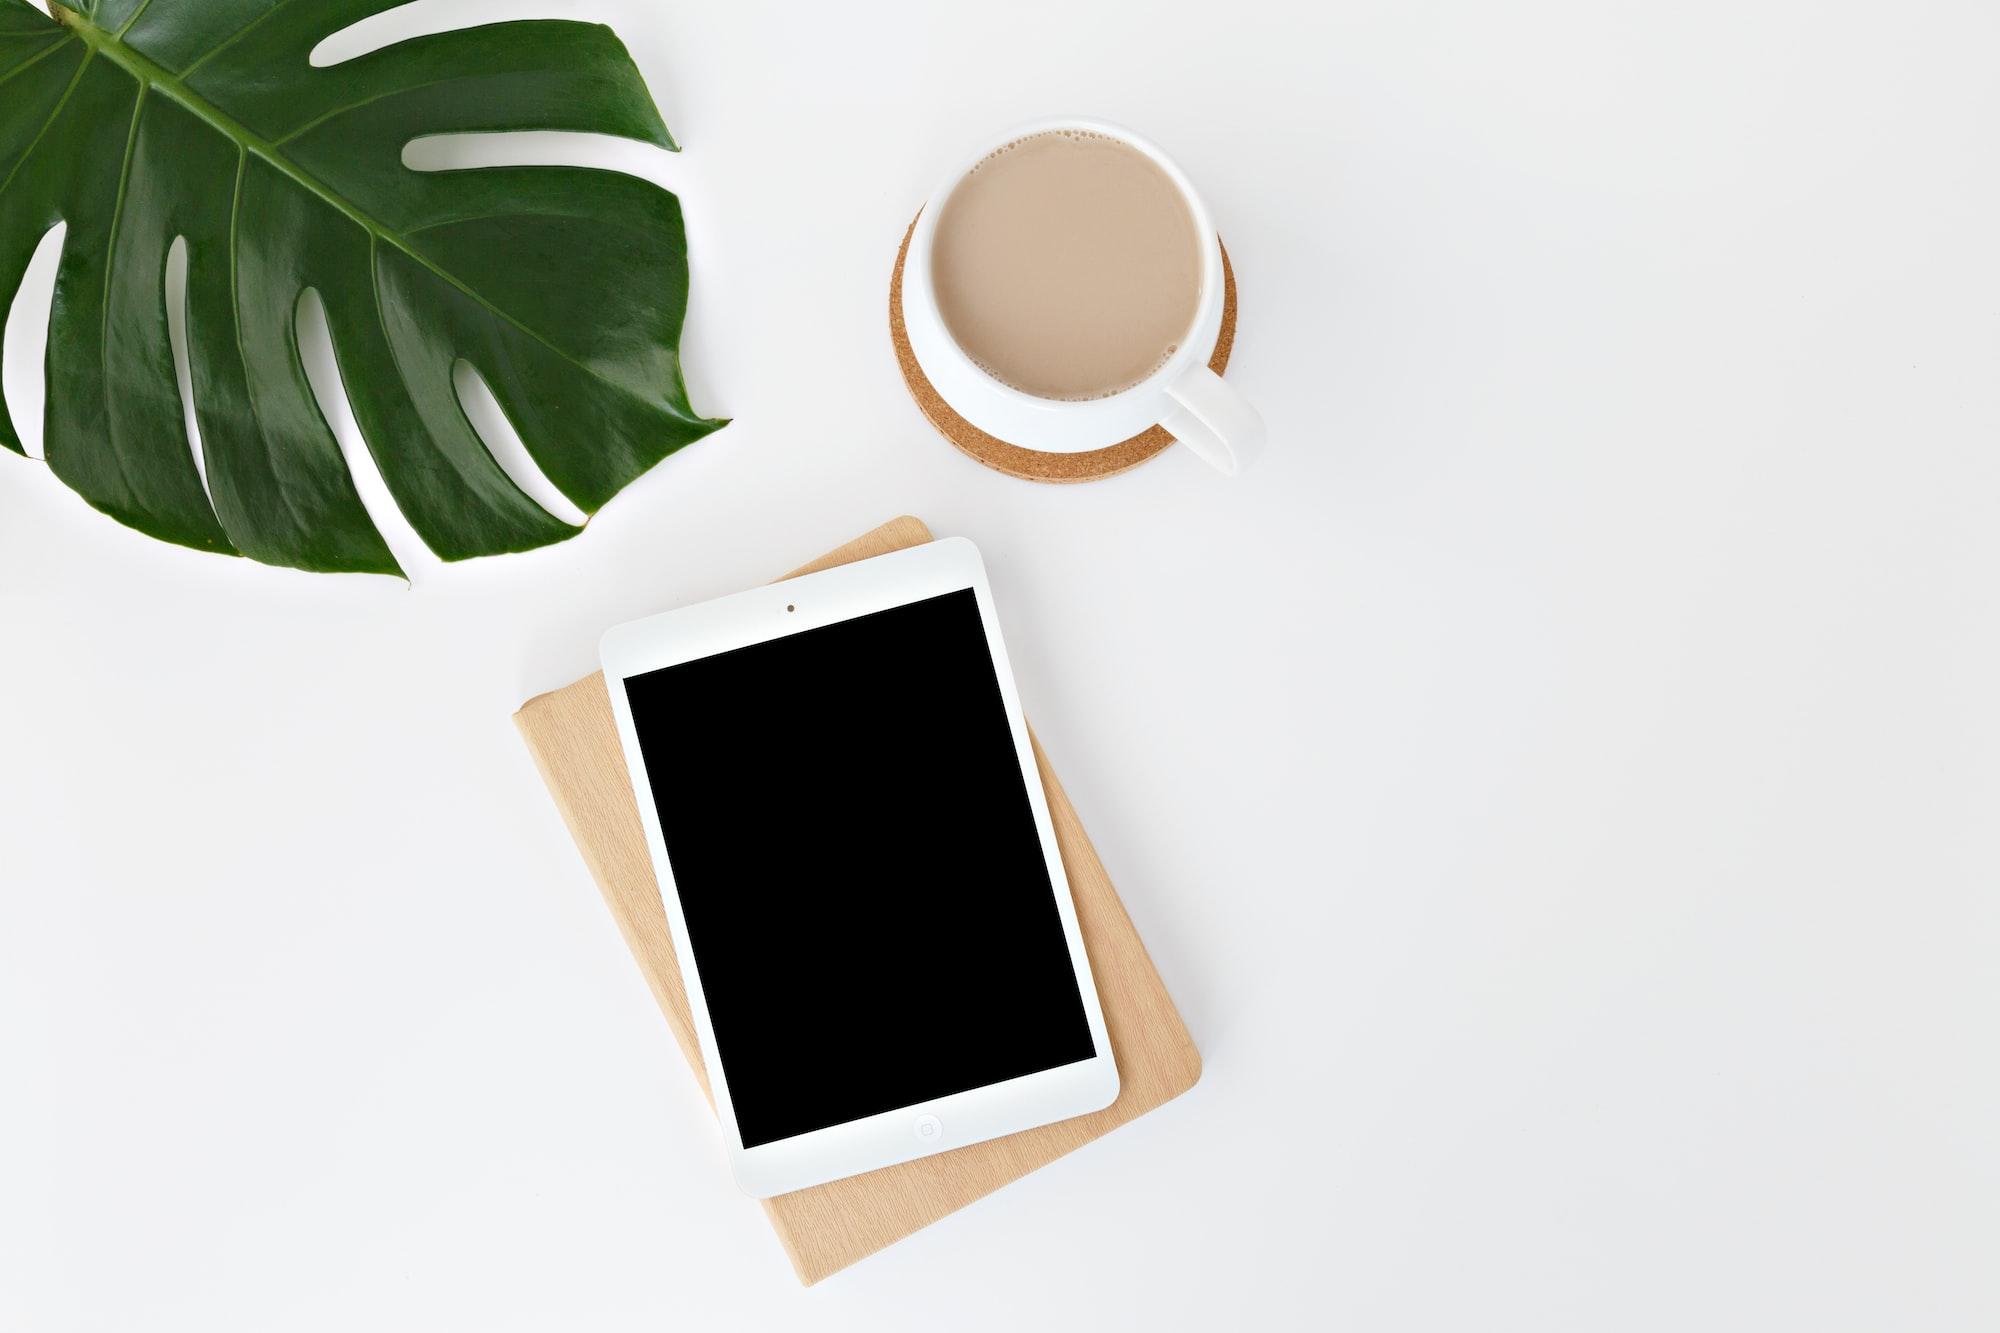 Sharing custom file types in iOS